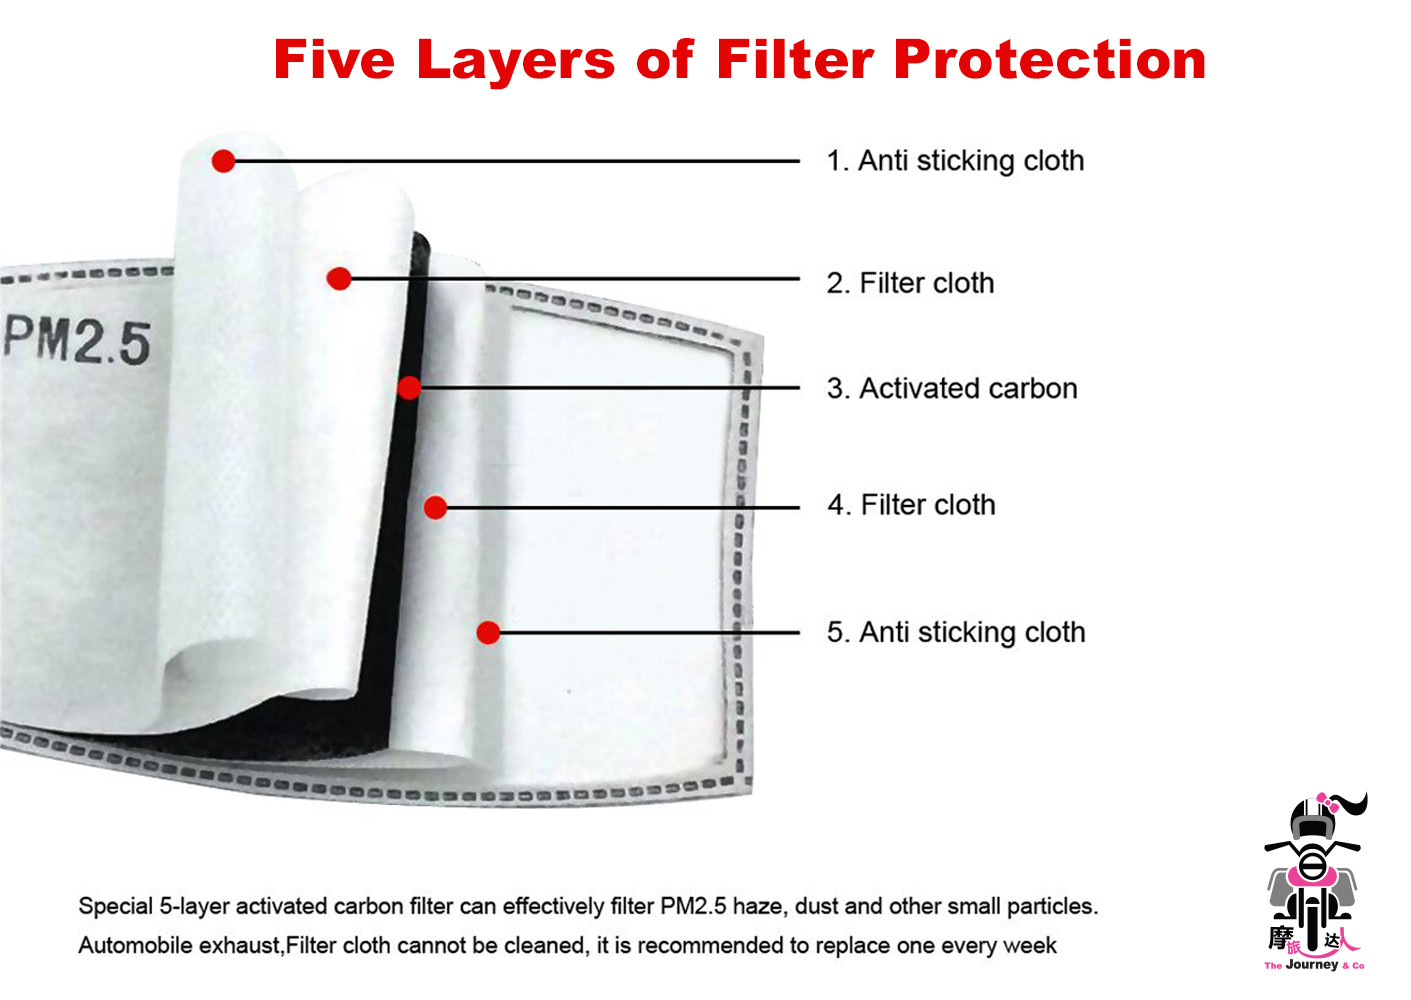 5 Layers_A Filterpad.jpg